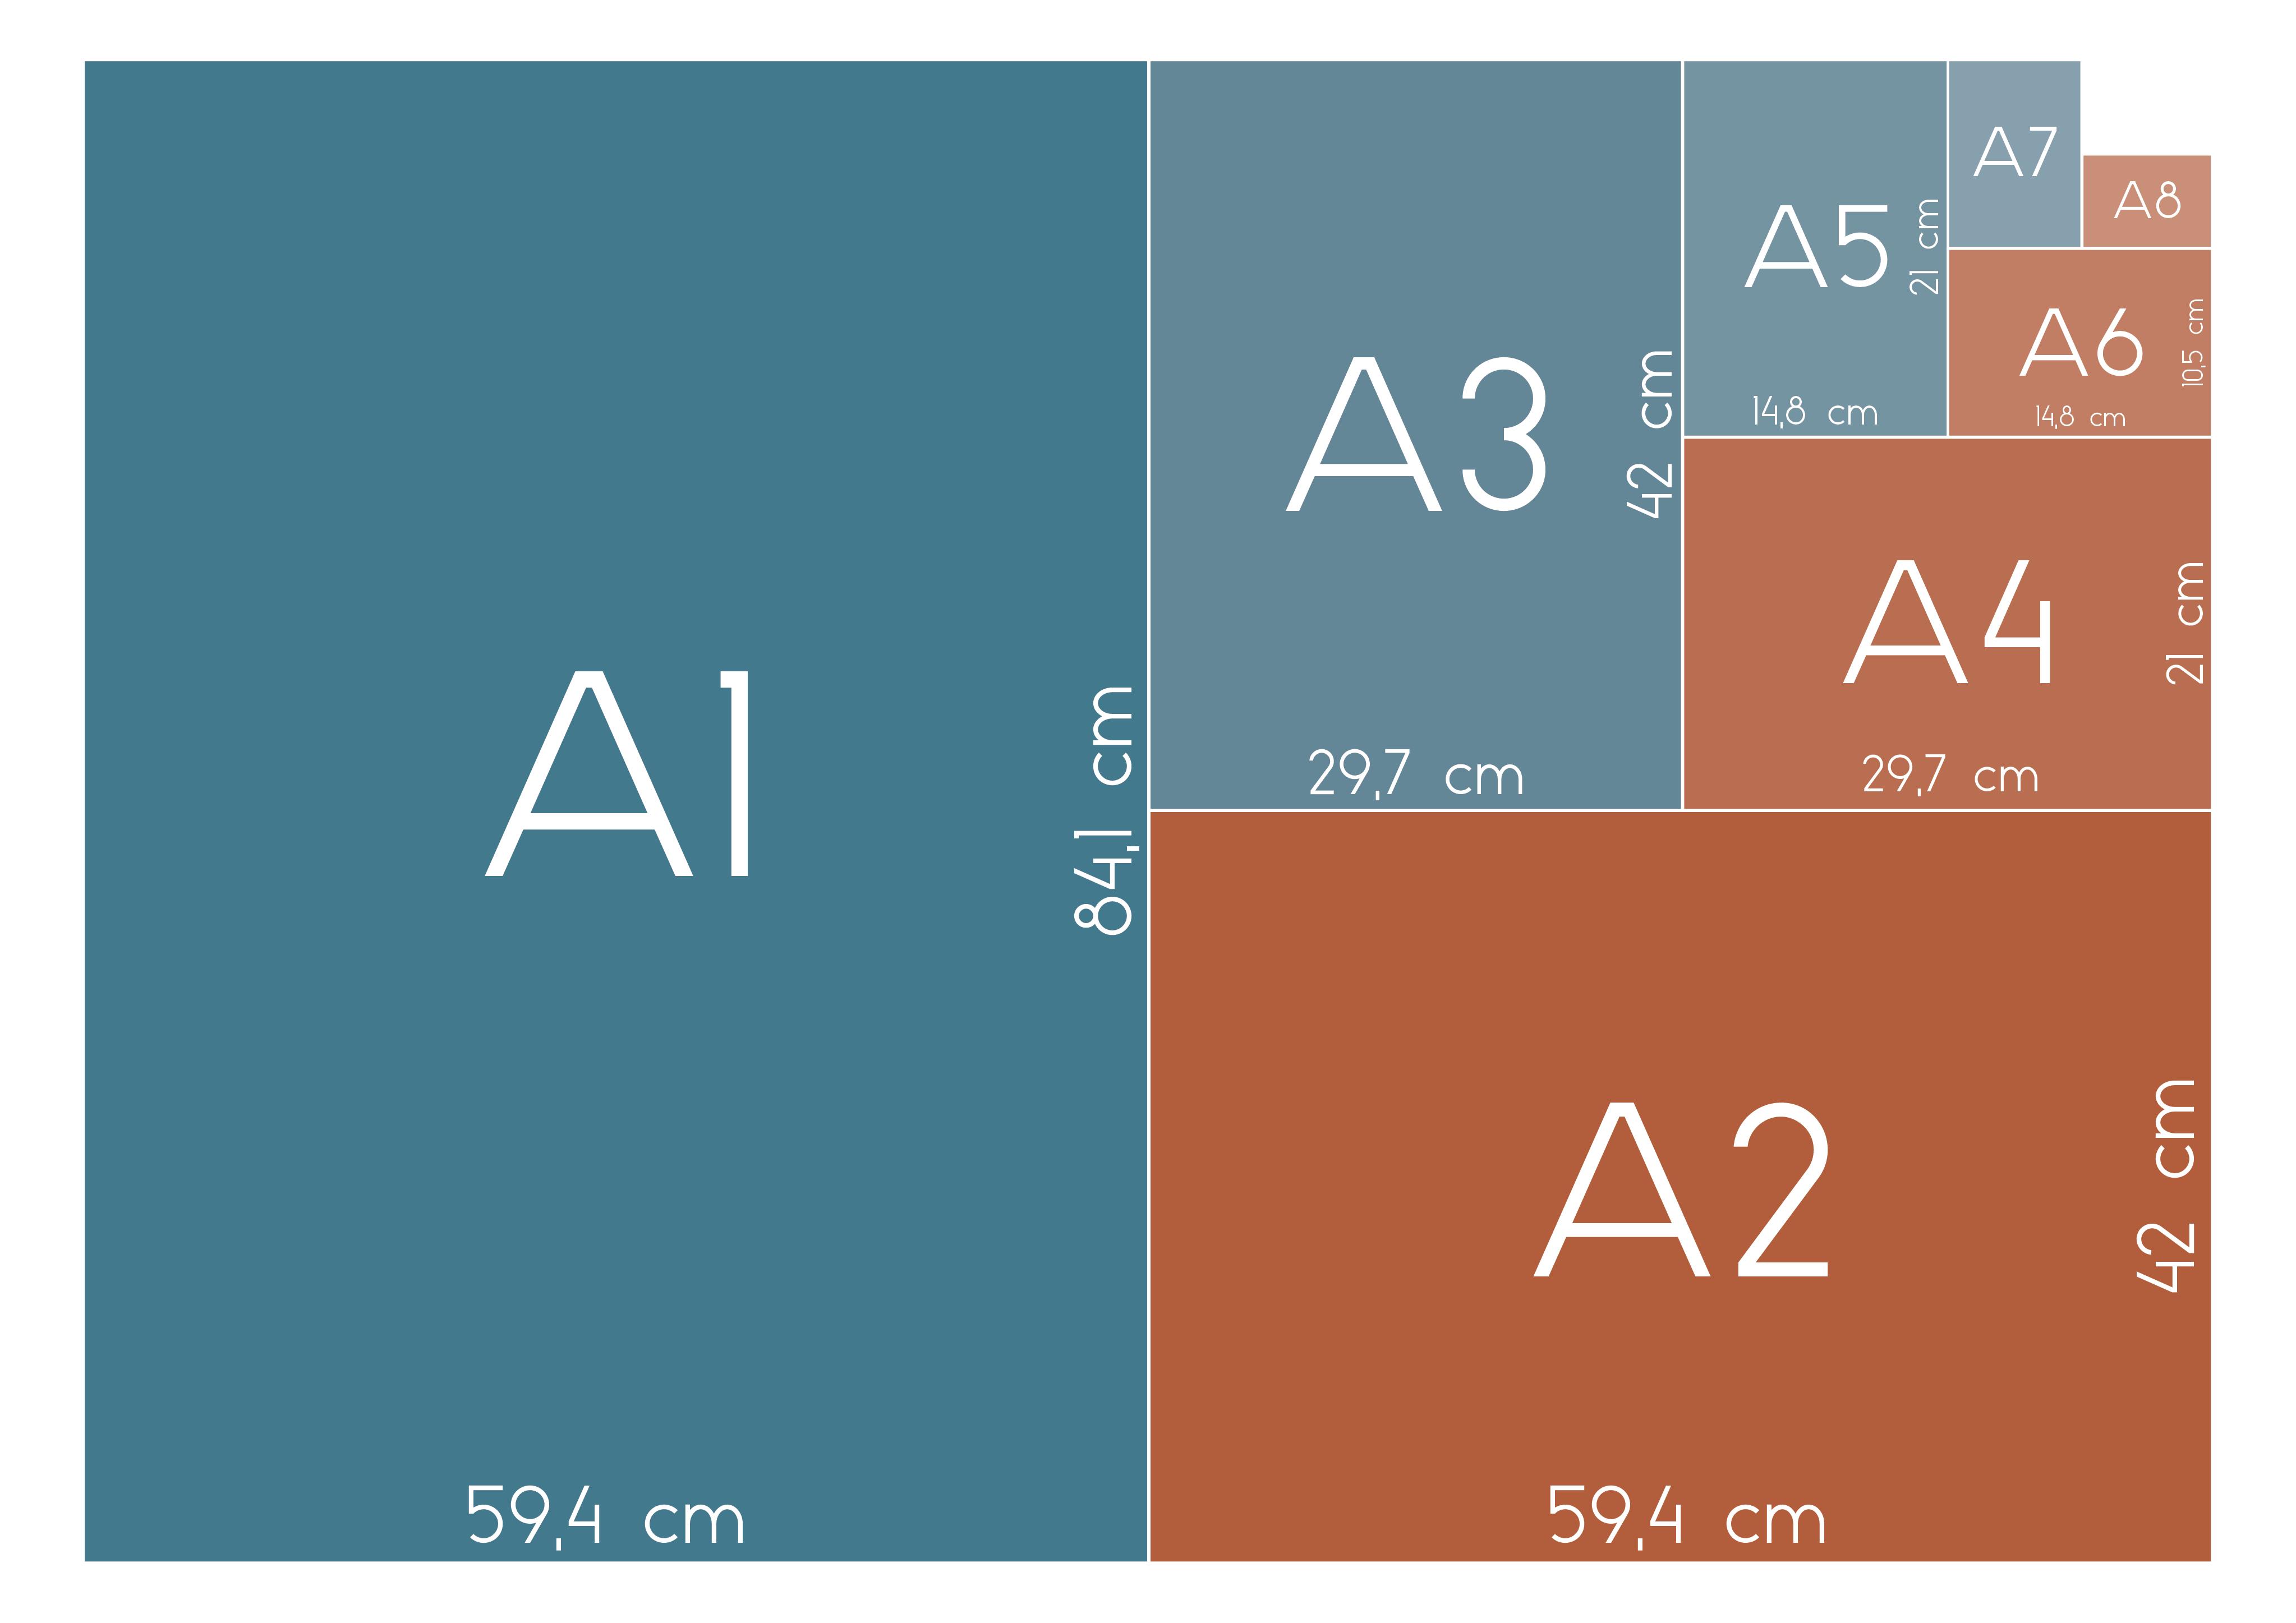 Exemples de format